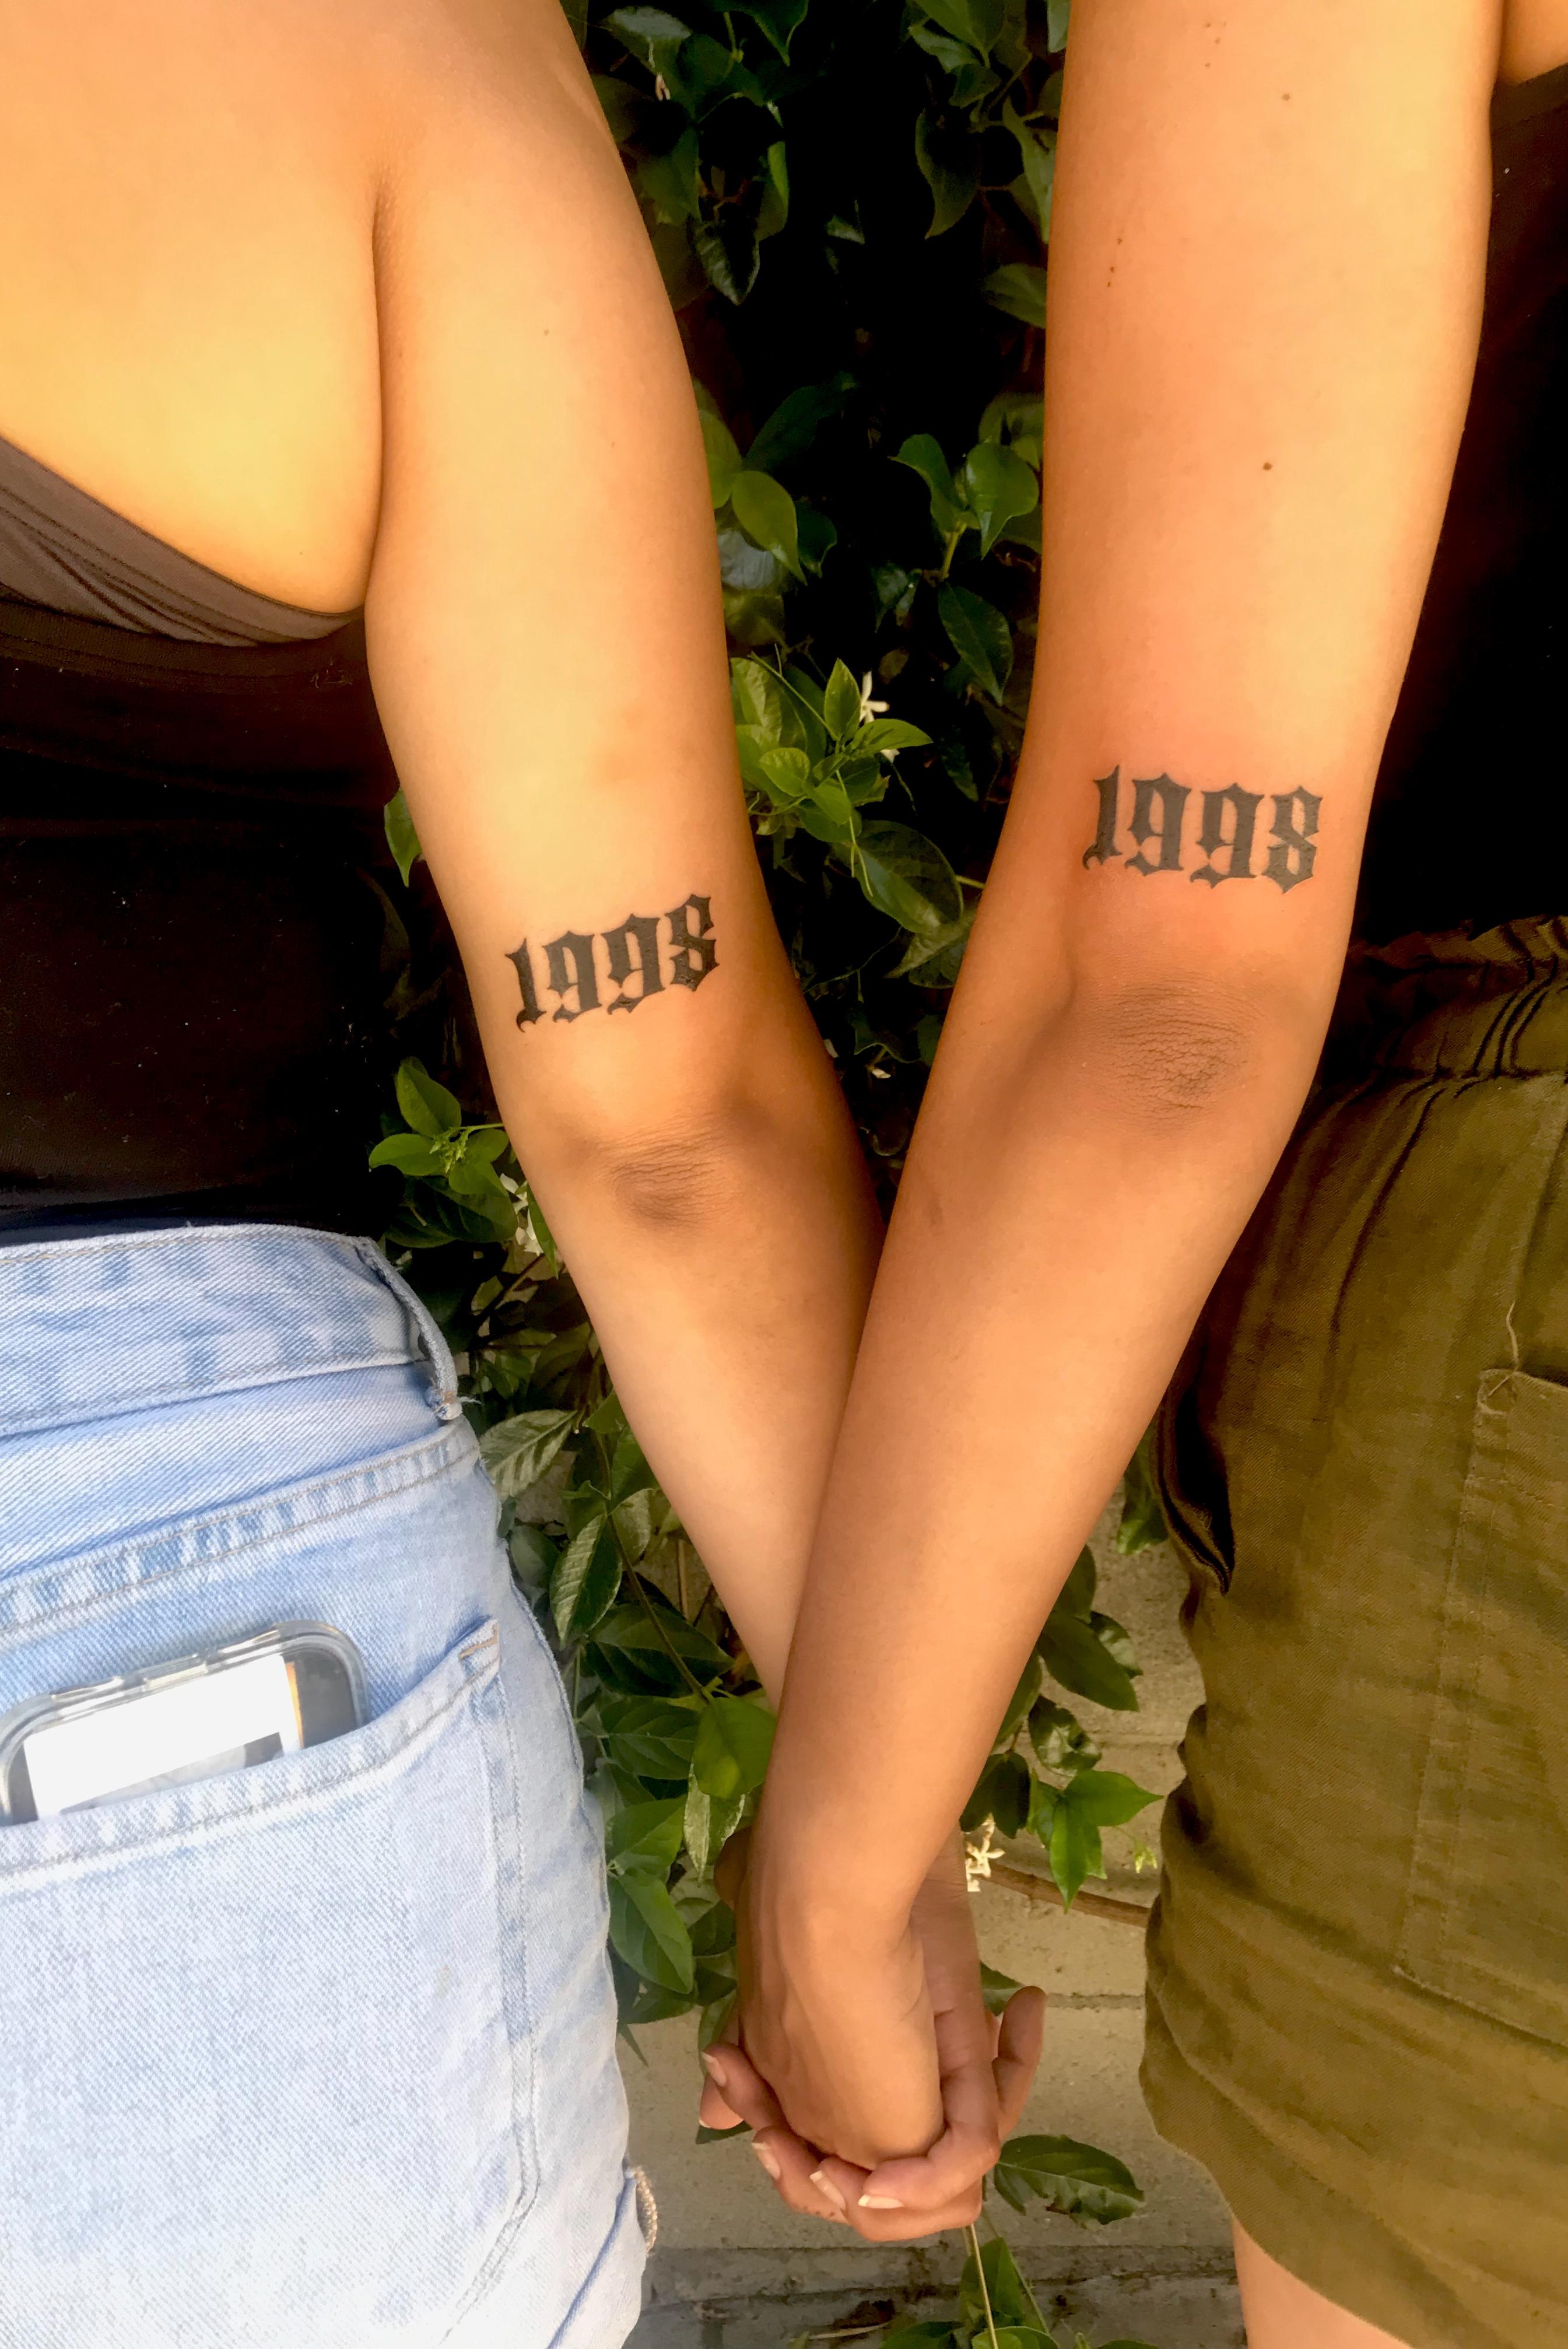 1998 tattoos 1 1